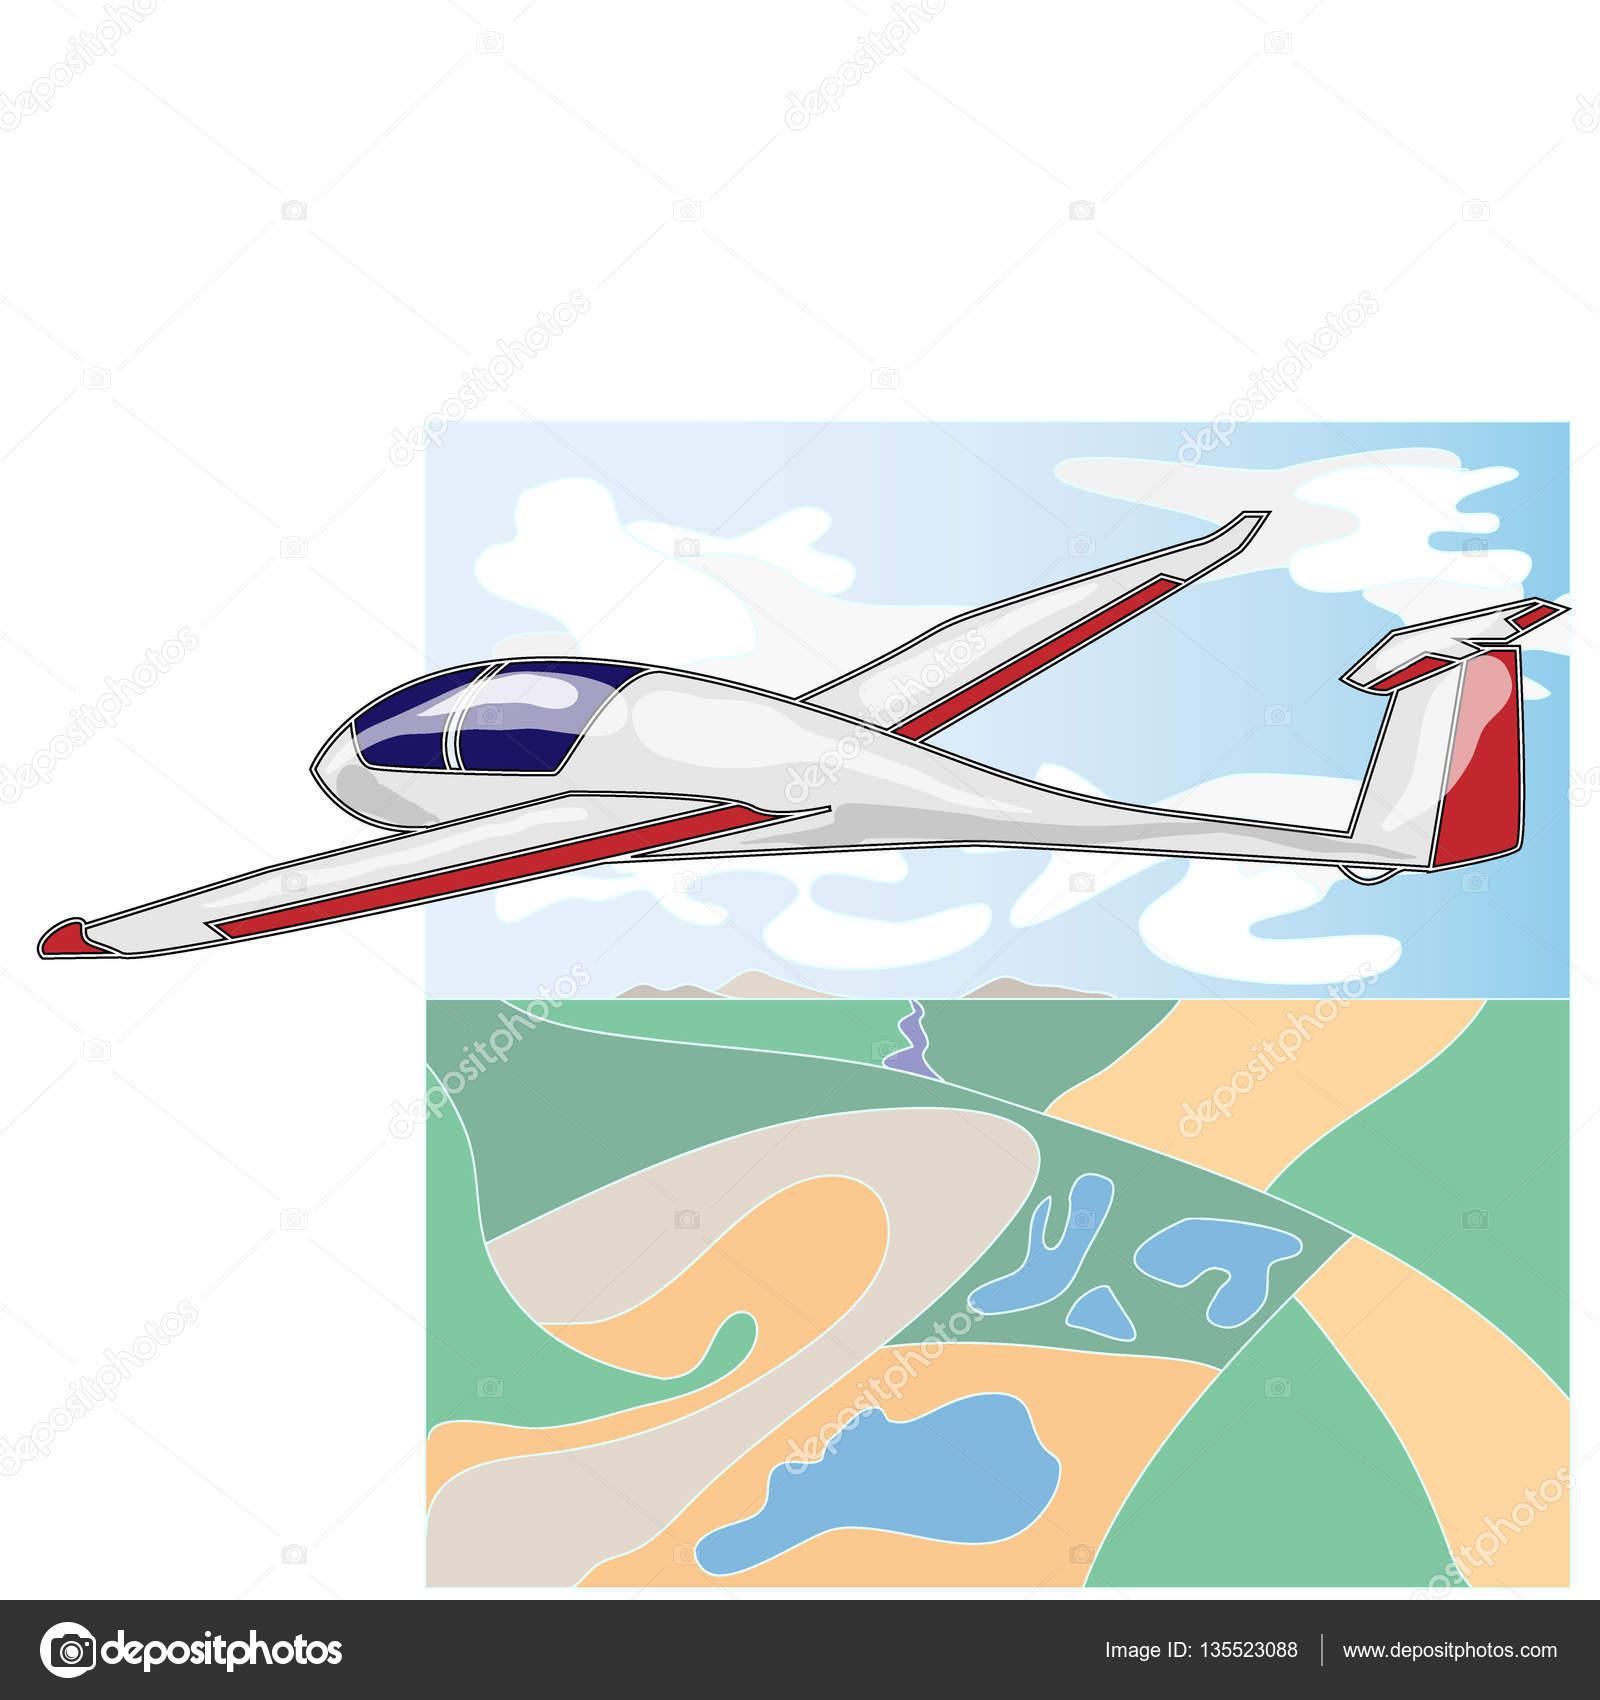 glider sailplane illustration isolated on white stock photo